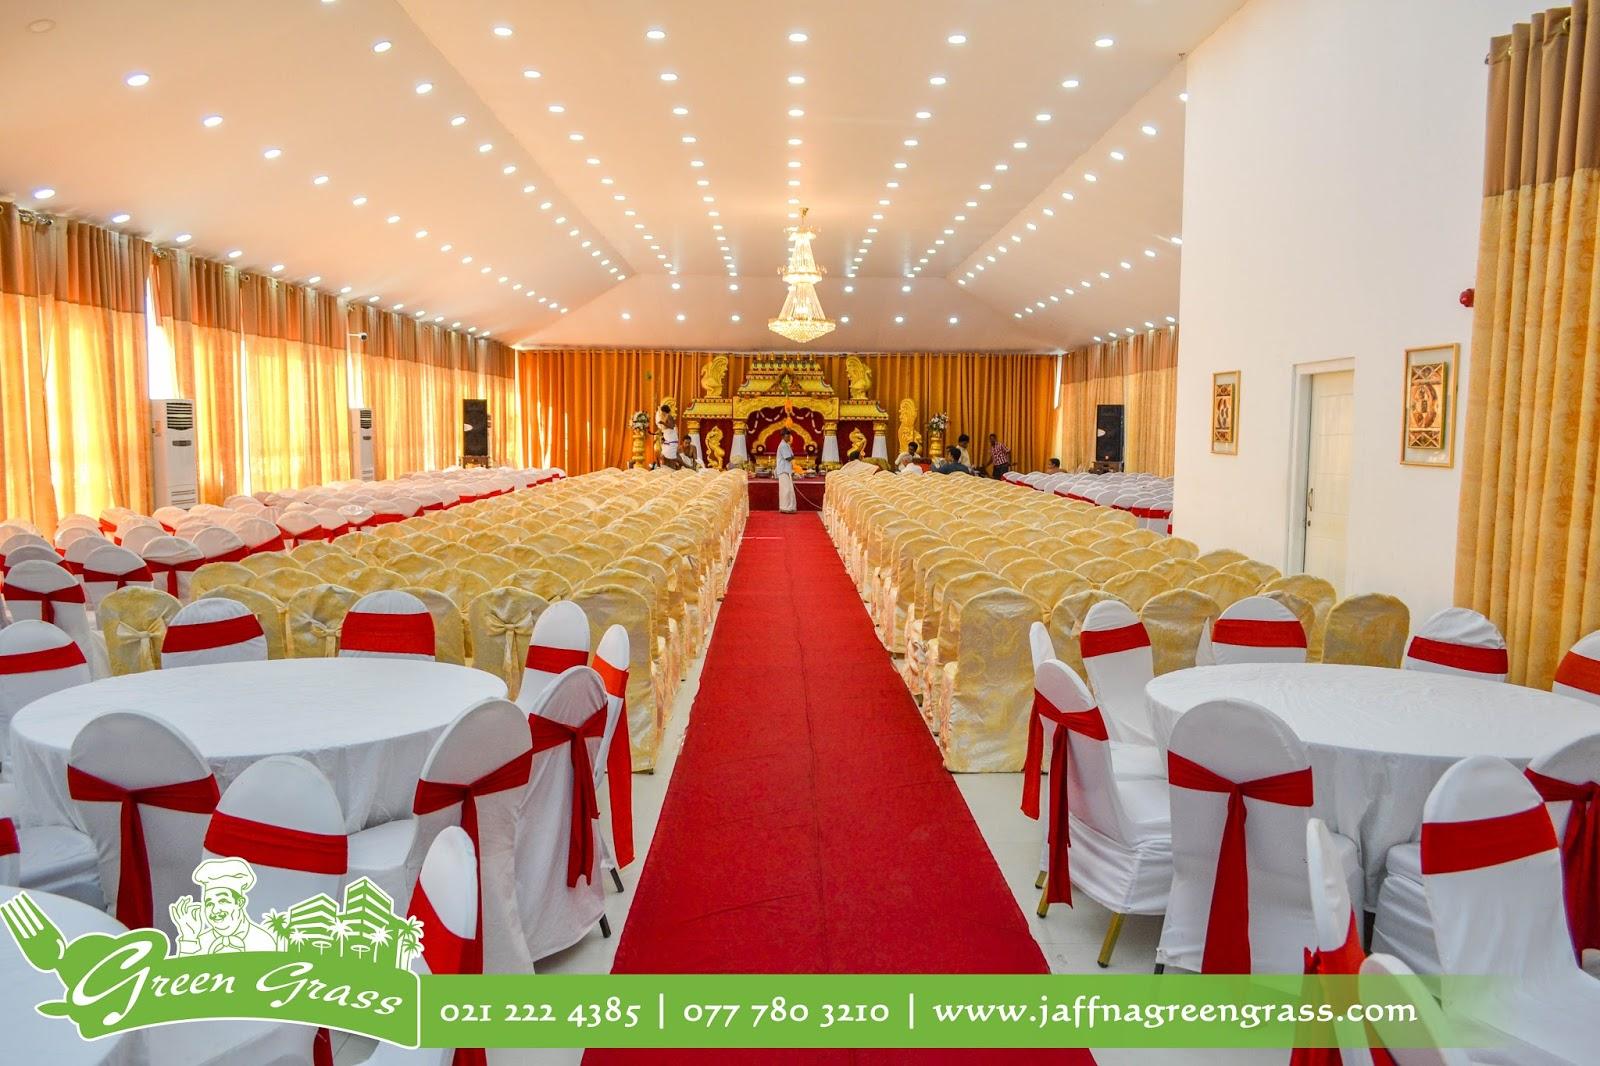 Decorated Wedding Hall At Green Grass Wedding Hall Jaffna For Hindu